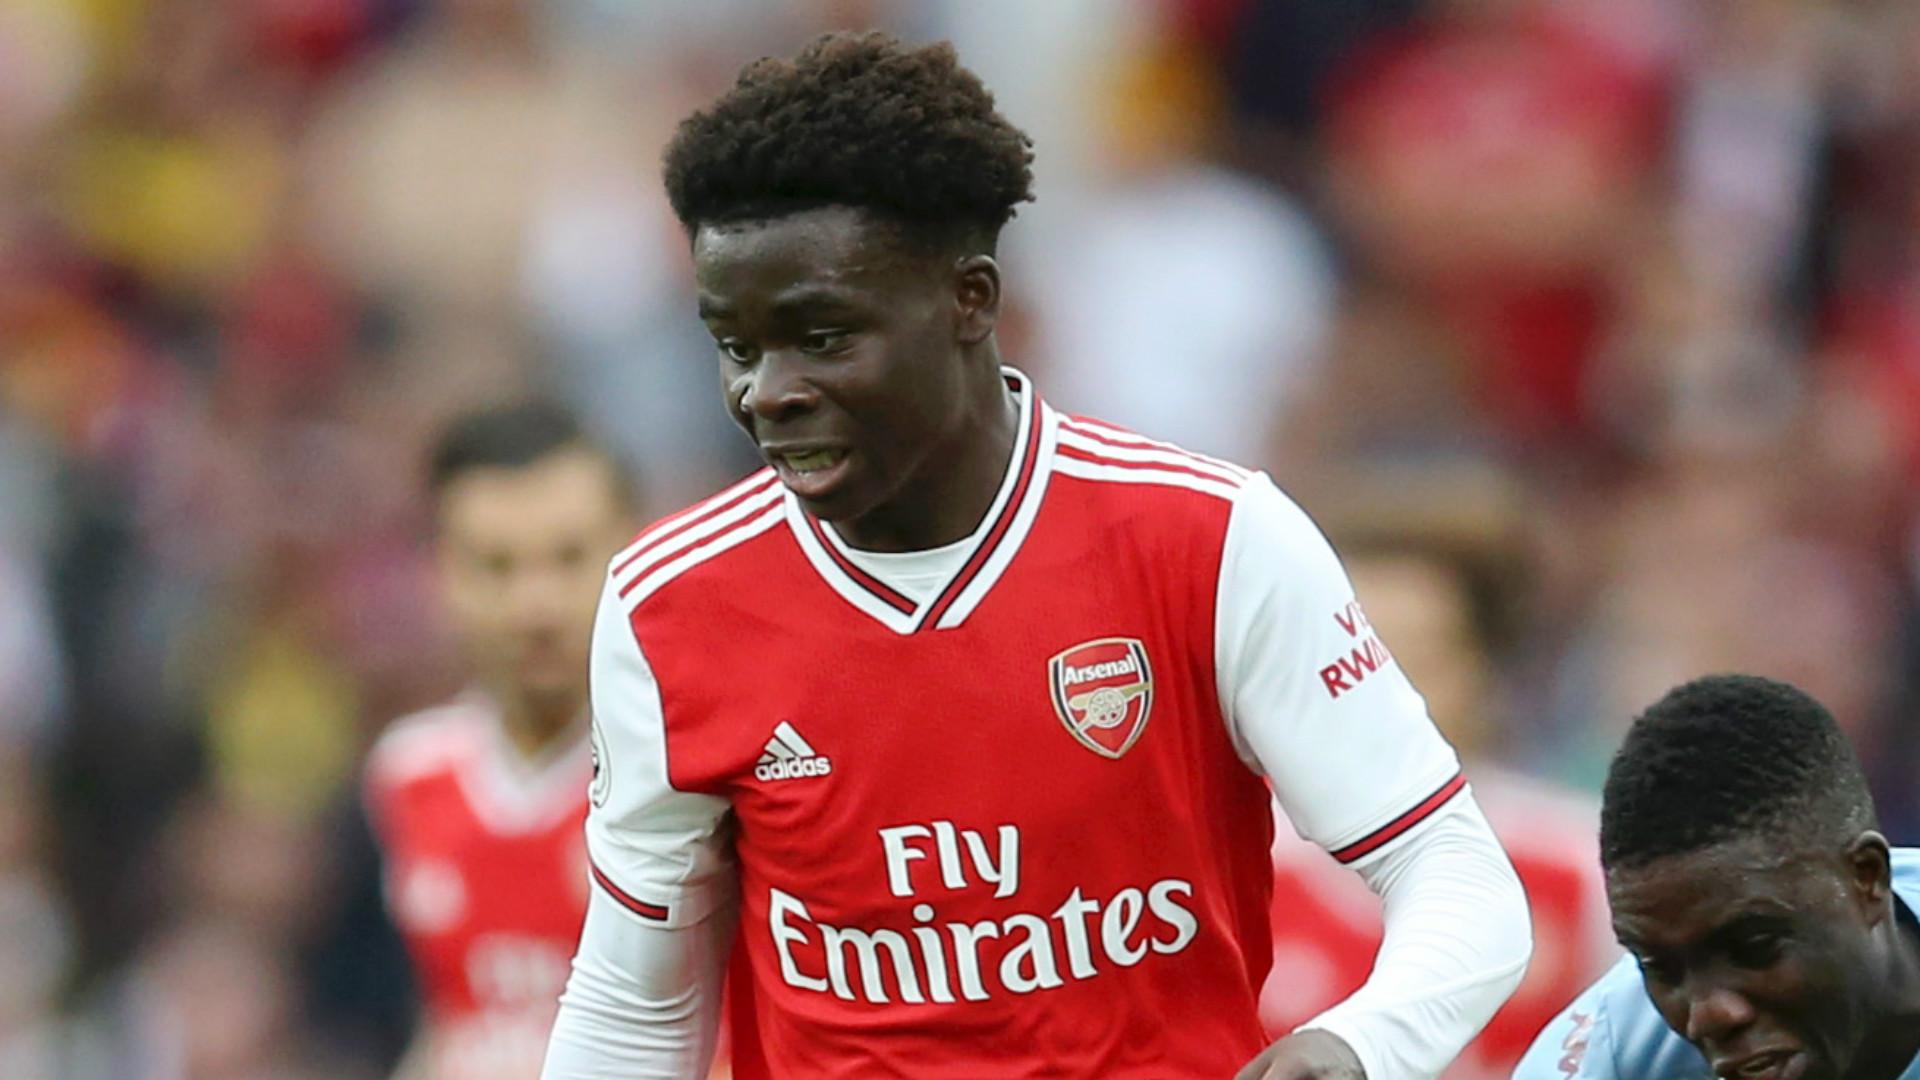 Arsenal manager Emery admits Bellerin big locker room leader